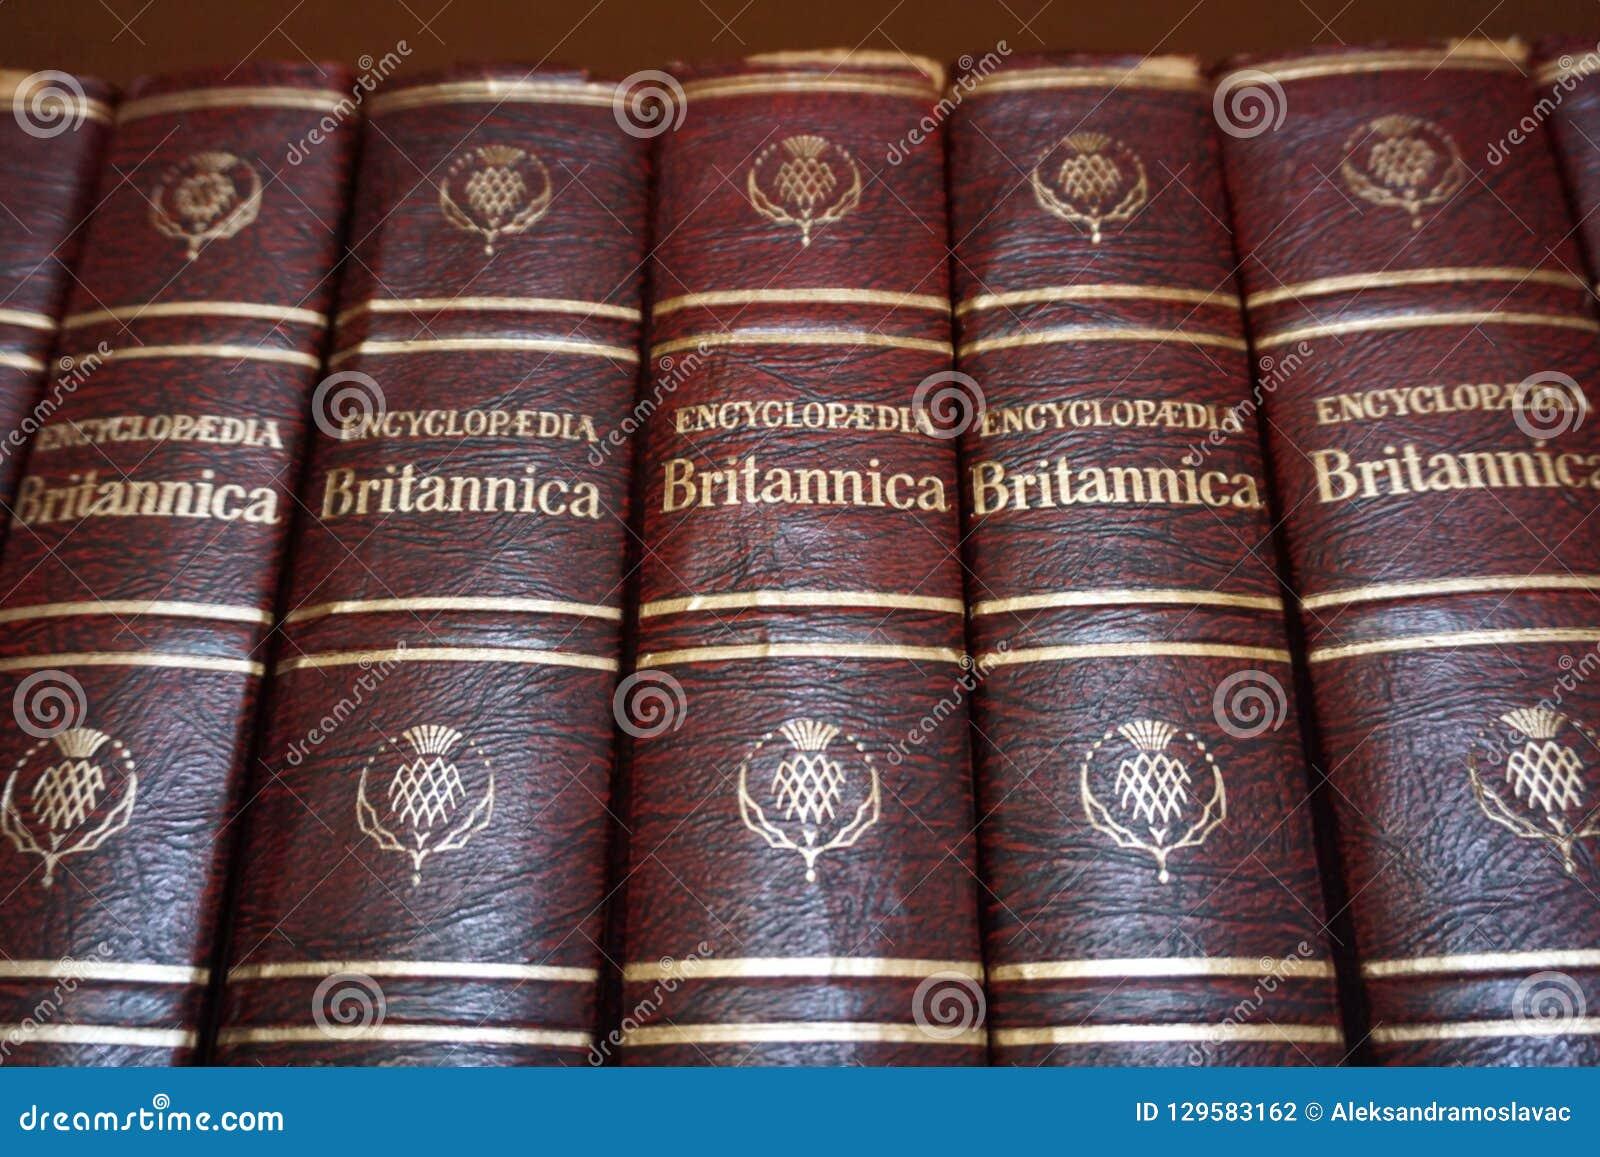 Rijeka, Croatia, September 25, 2018  Encyclopedia Britannica